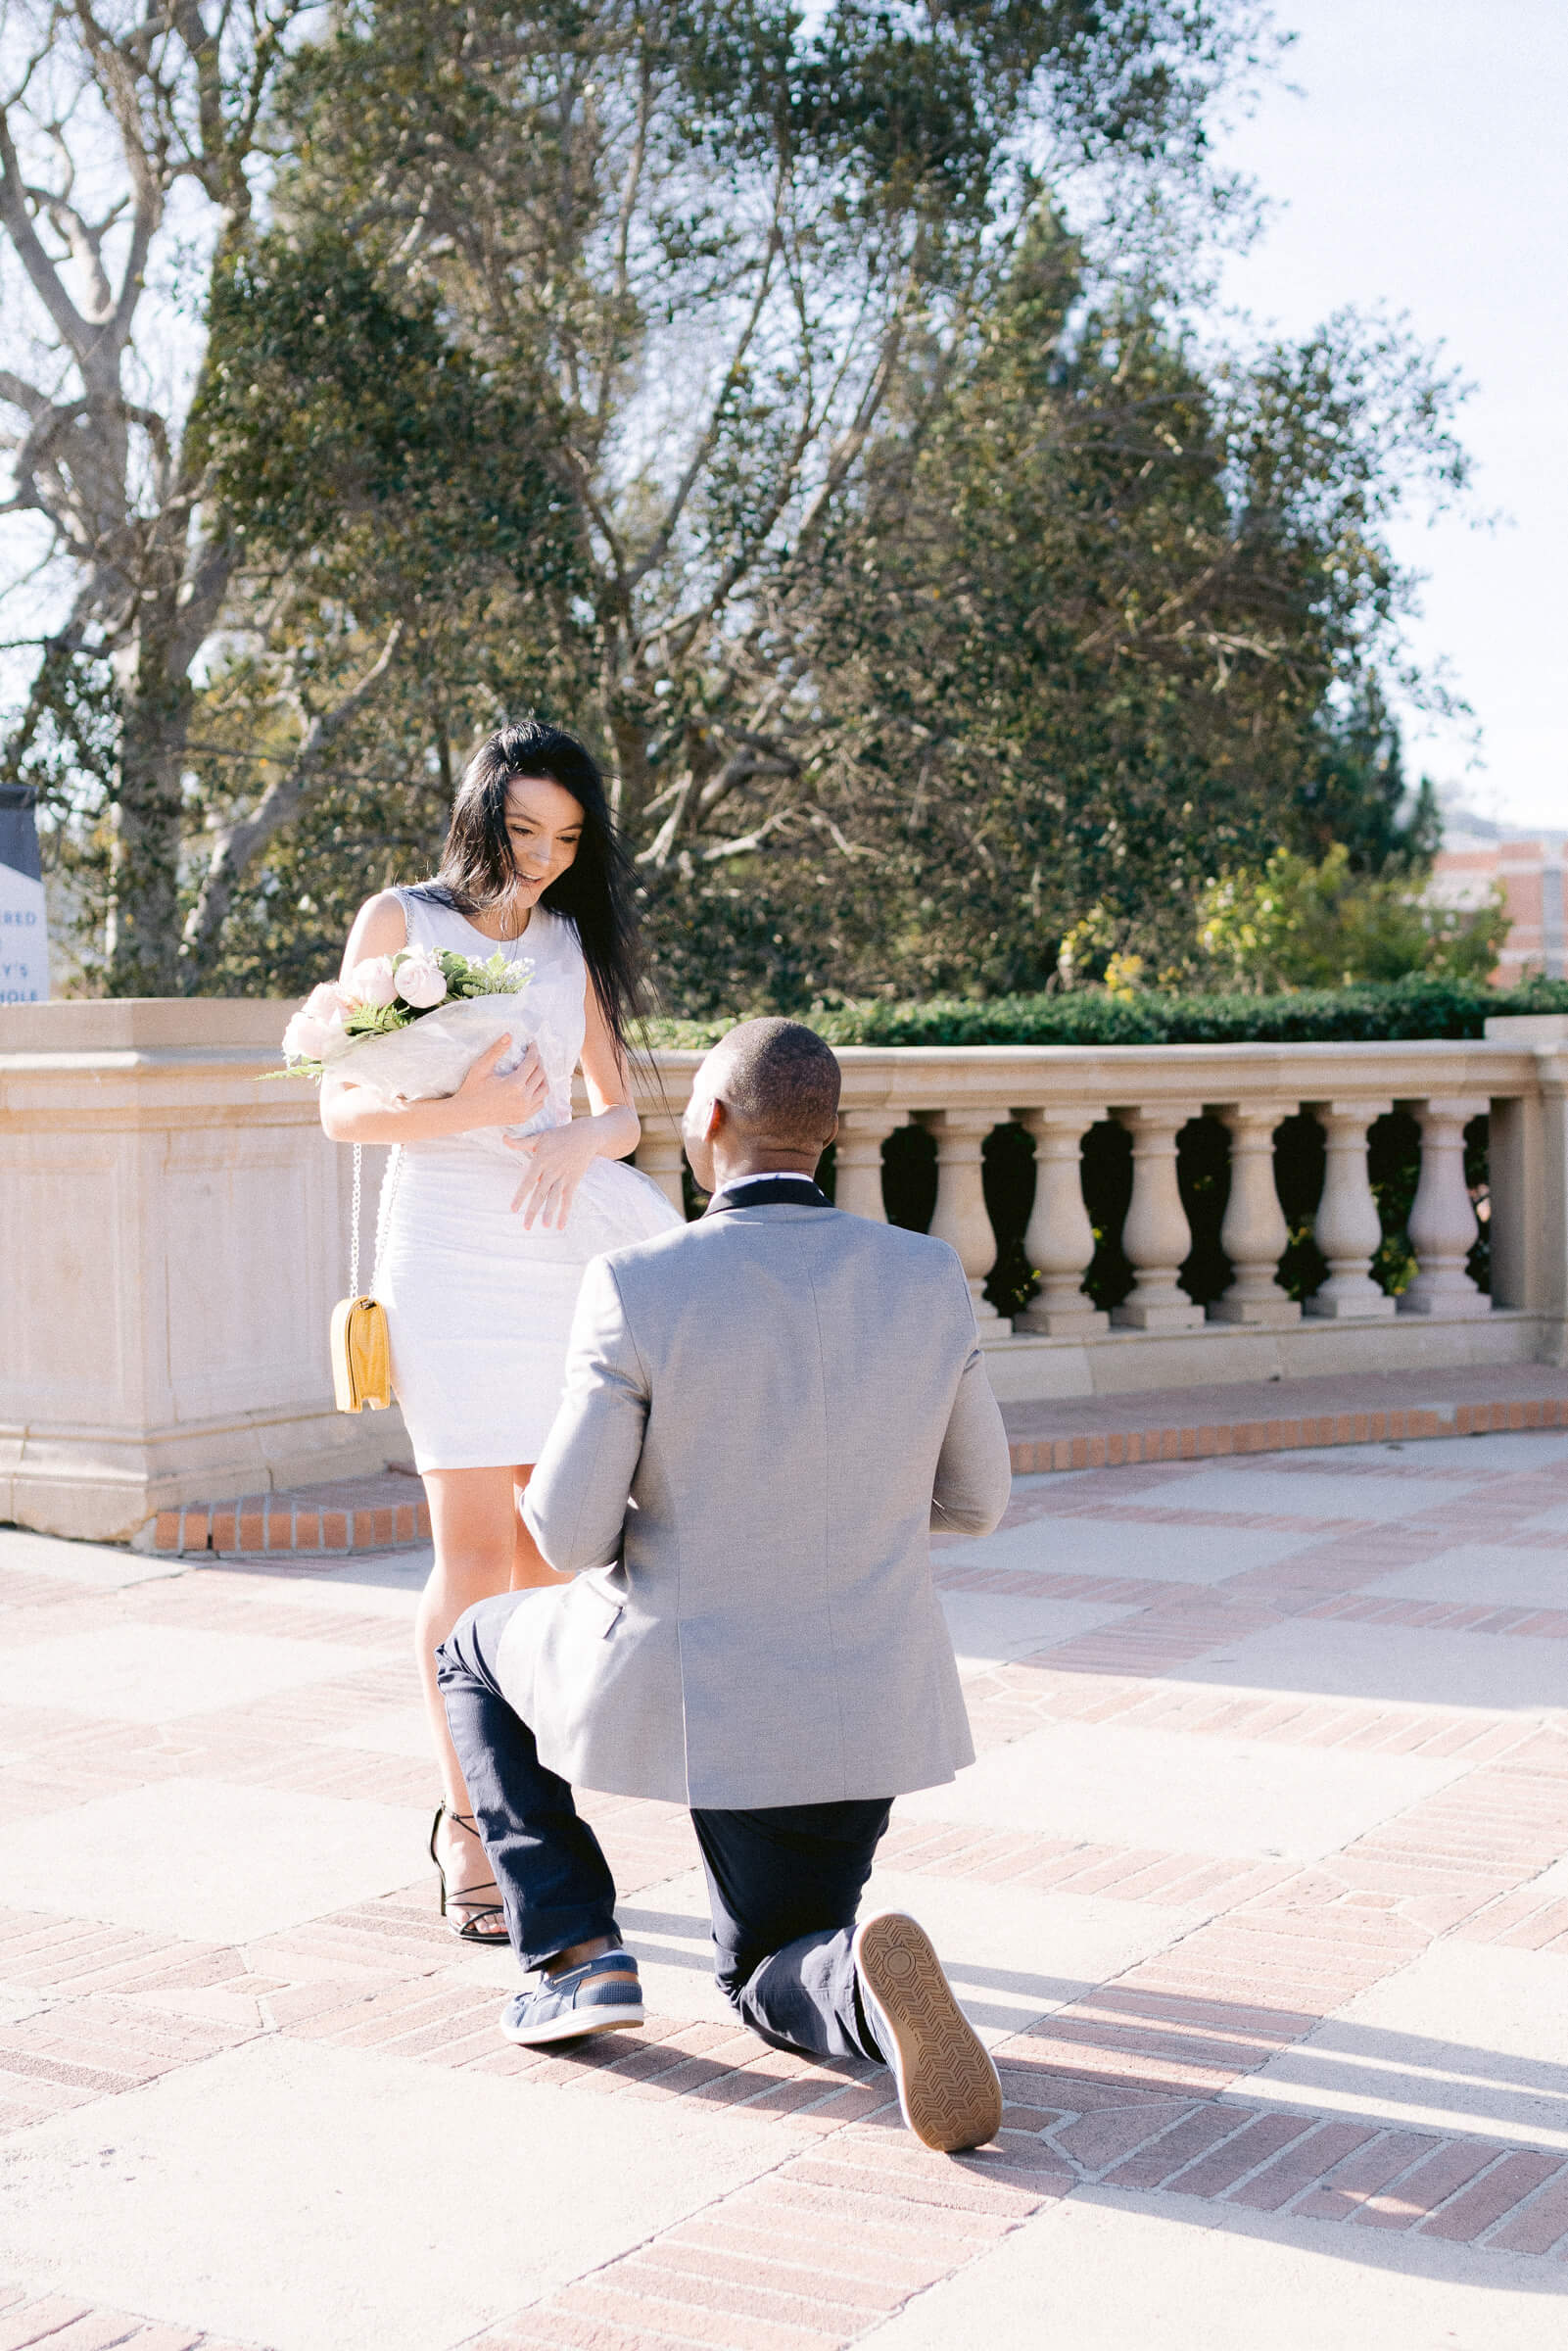 ucla-los-angeles-proposal-photographer-9.jpg